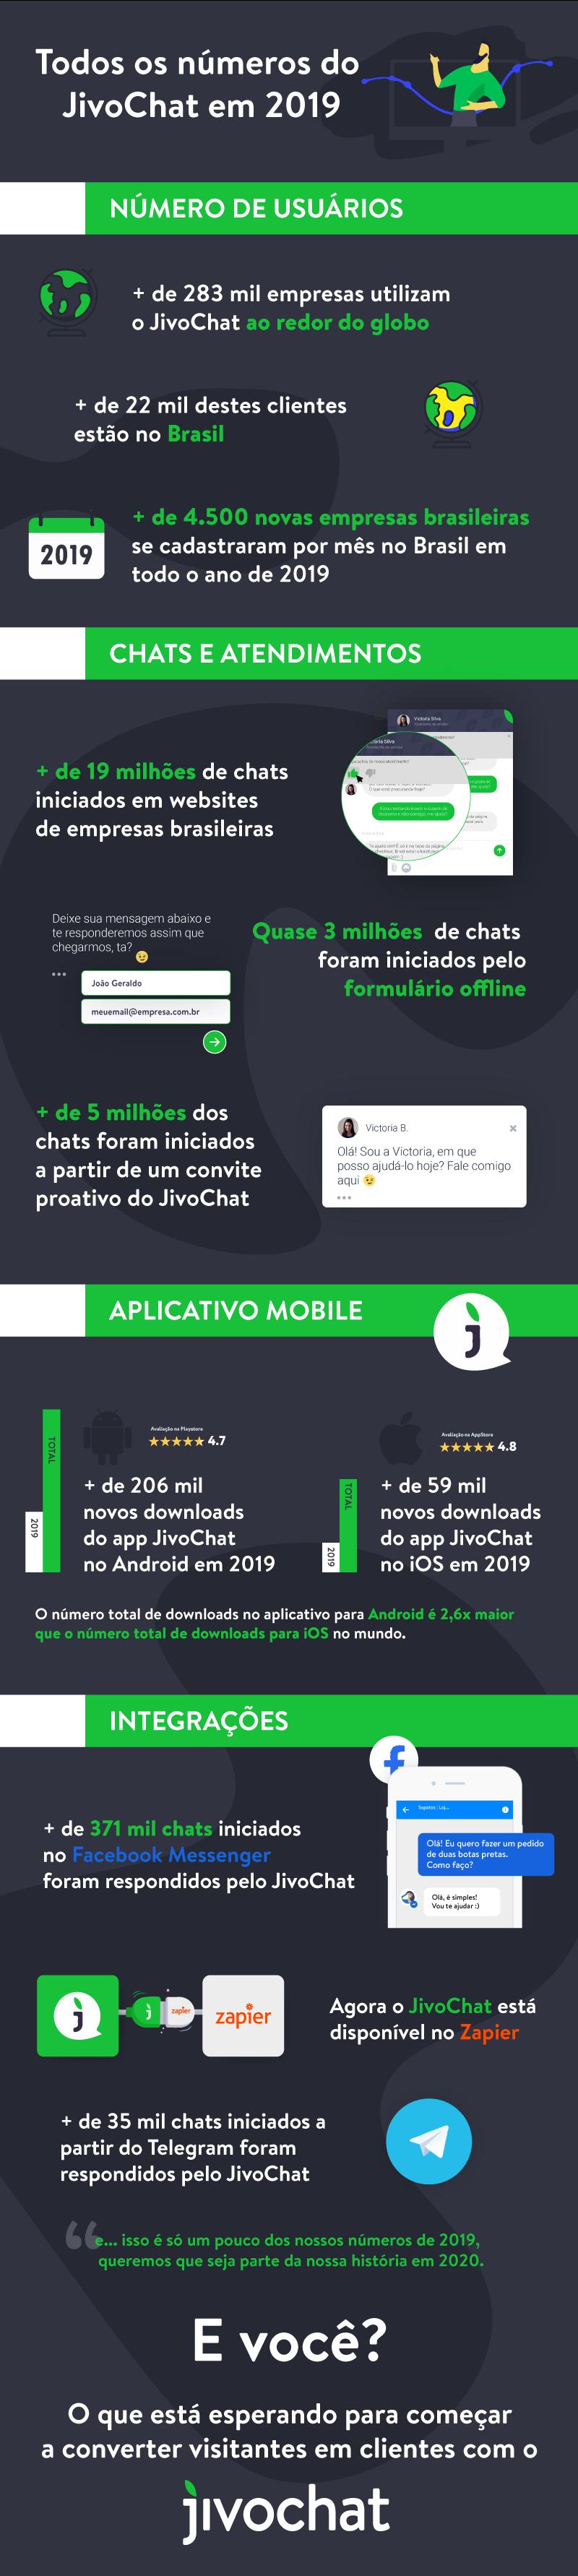 Infográfico do JivoChat em 2019